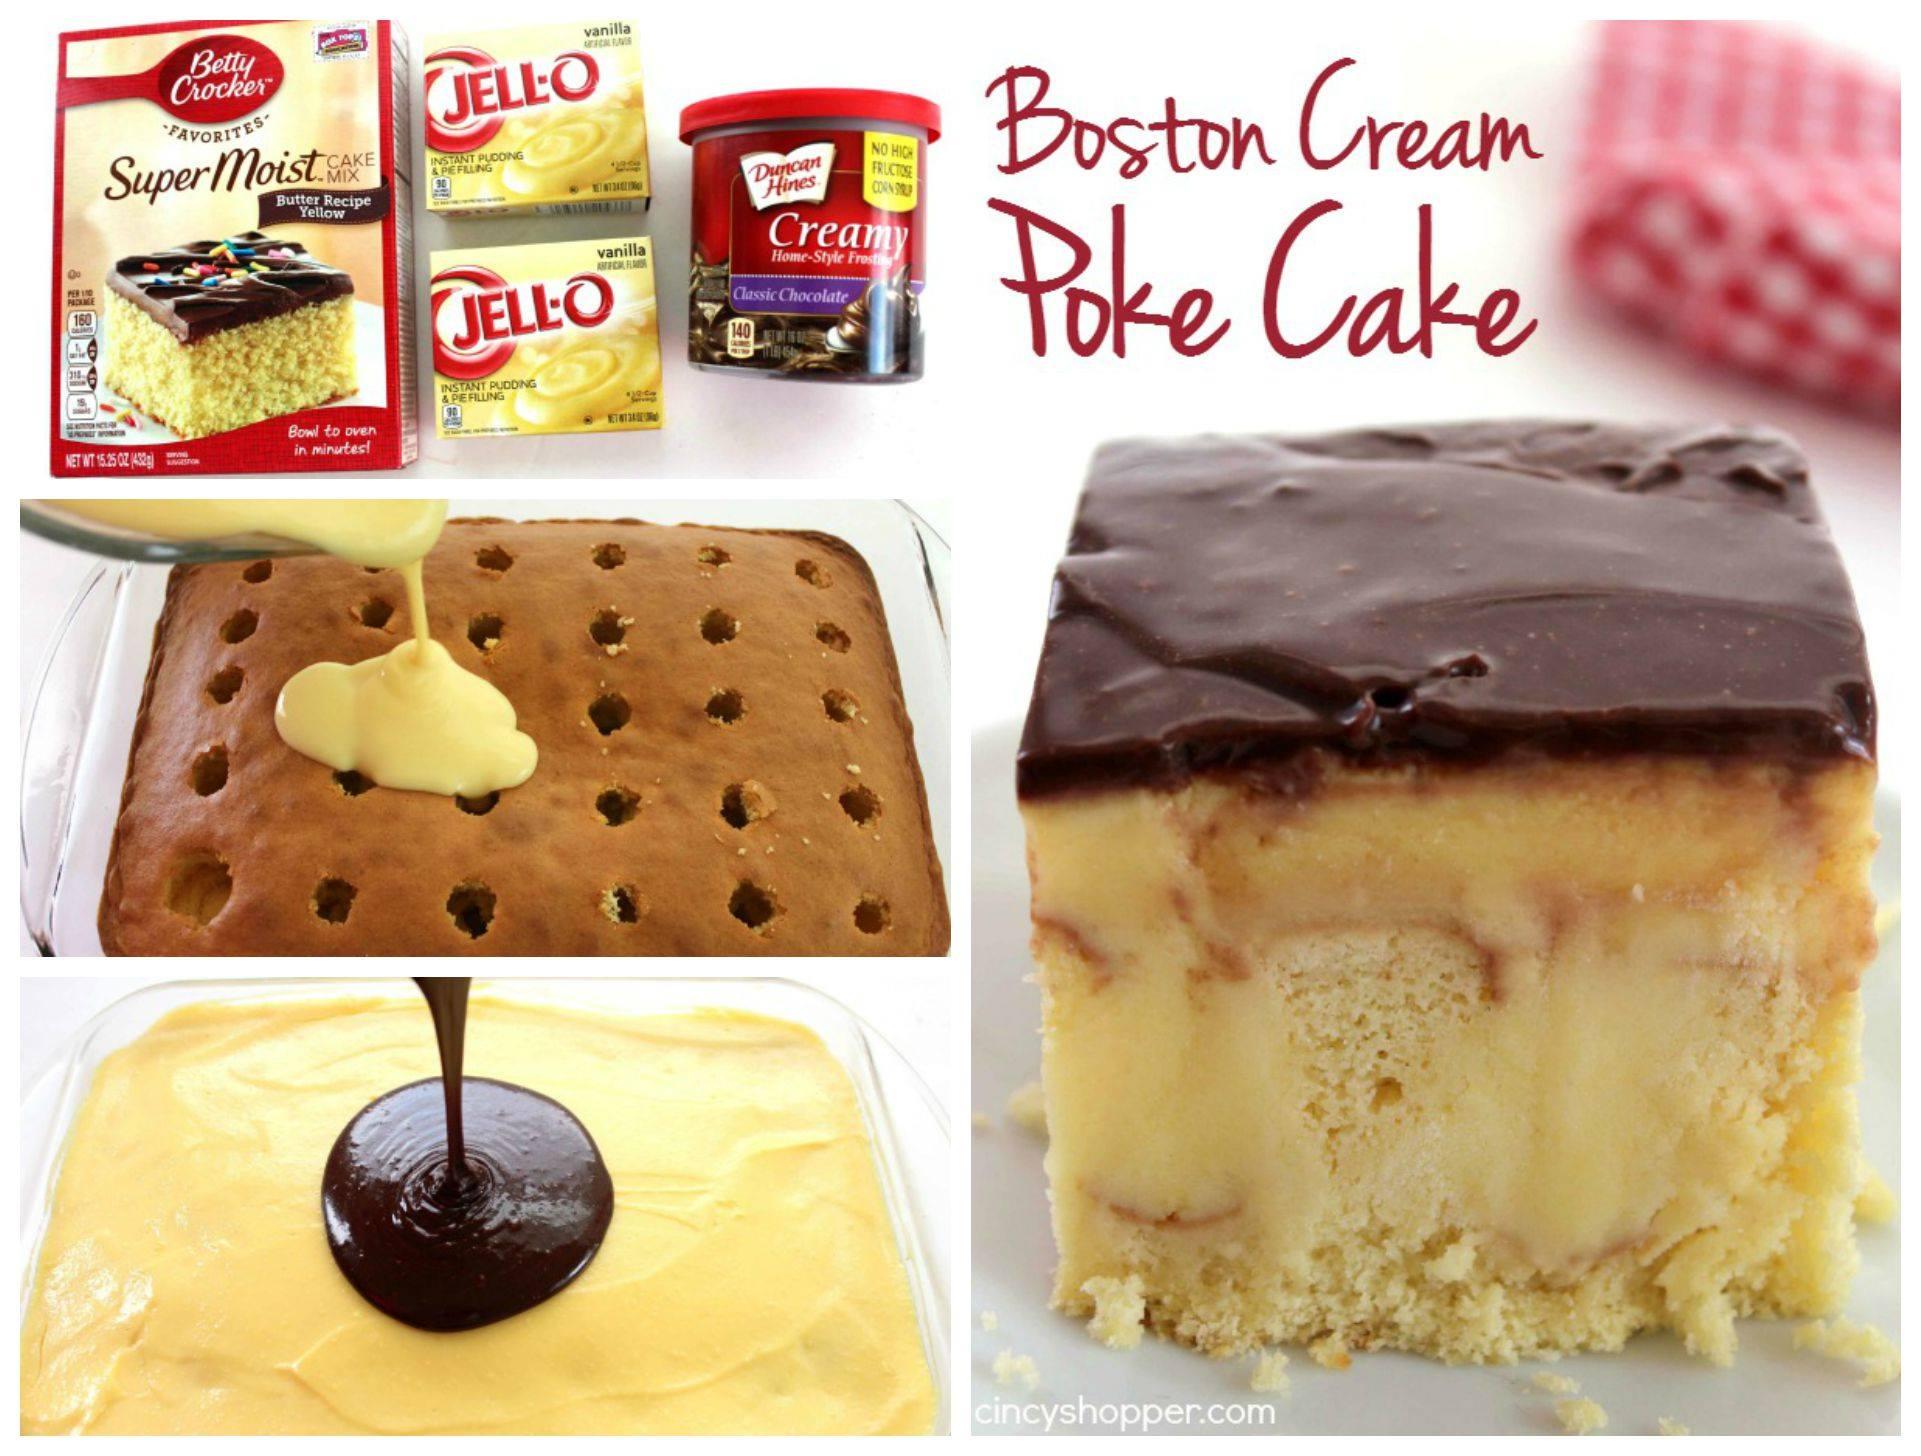 Boston Cream Poke Cake   25+ chocolate lover dessert recipes